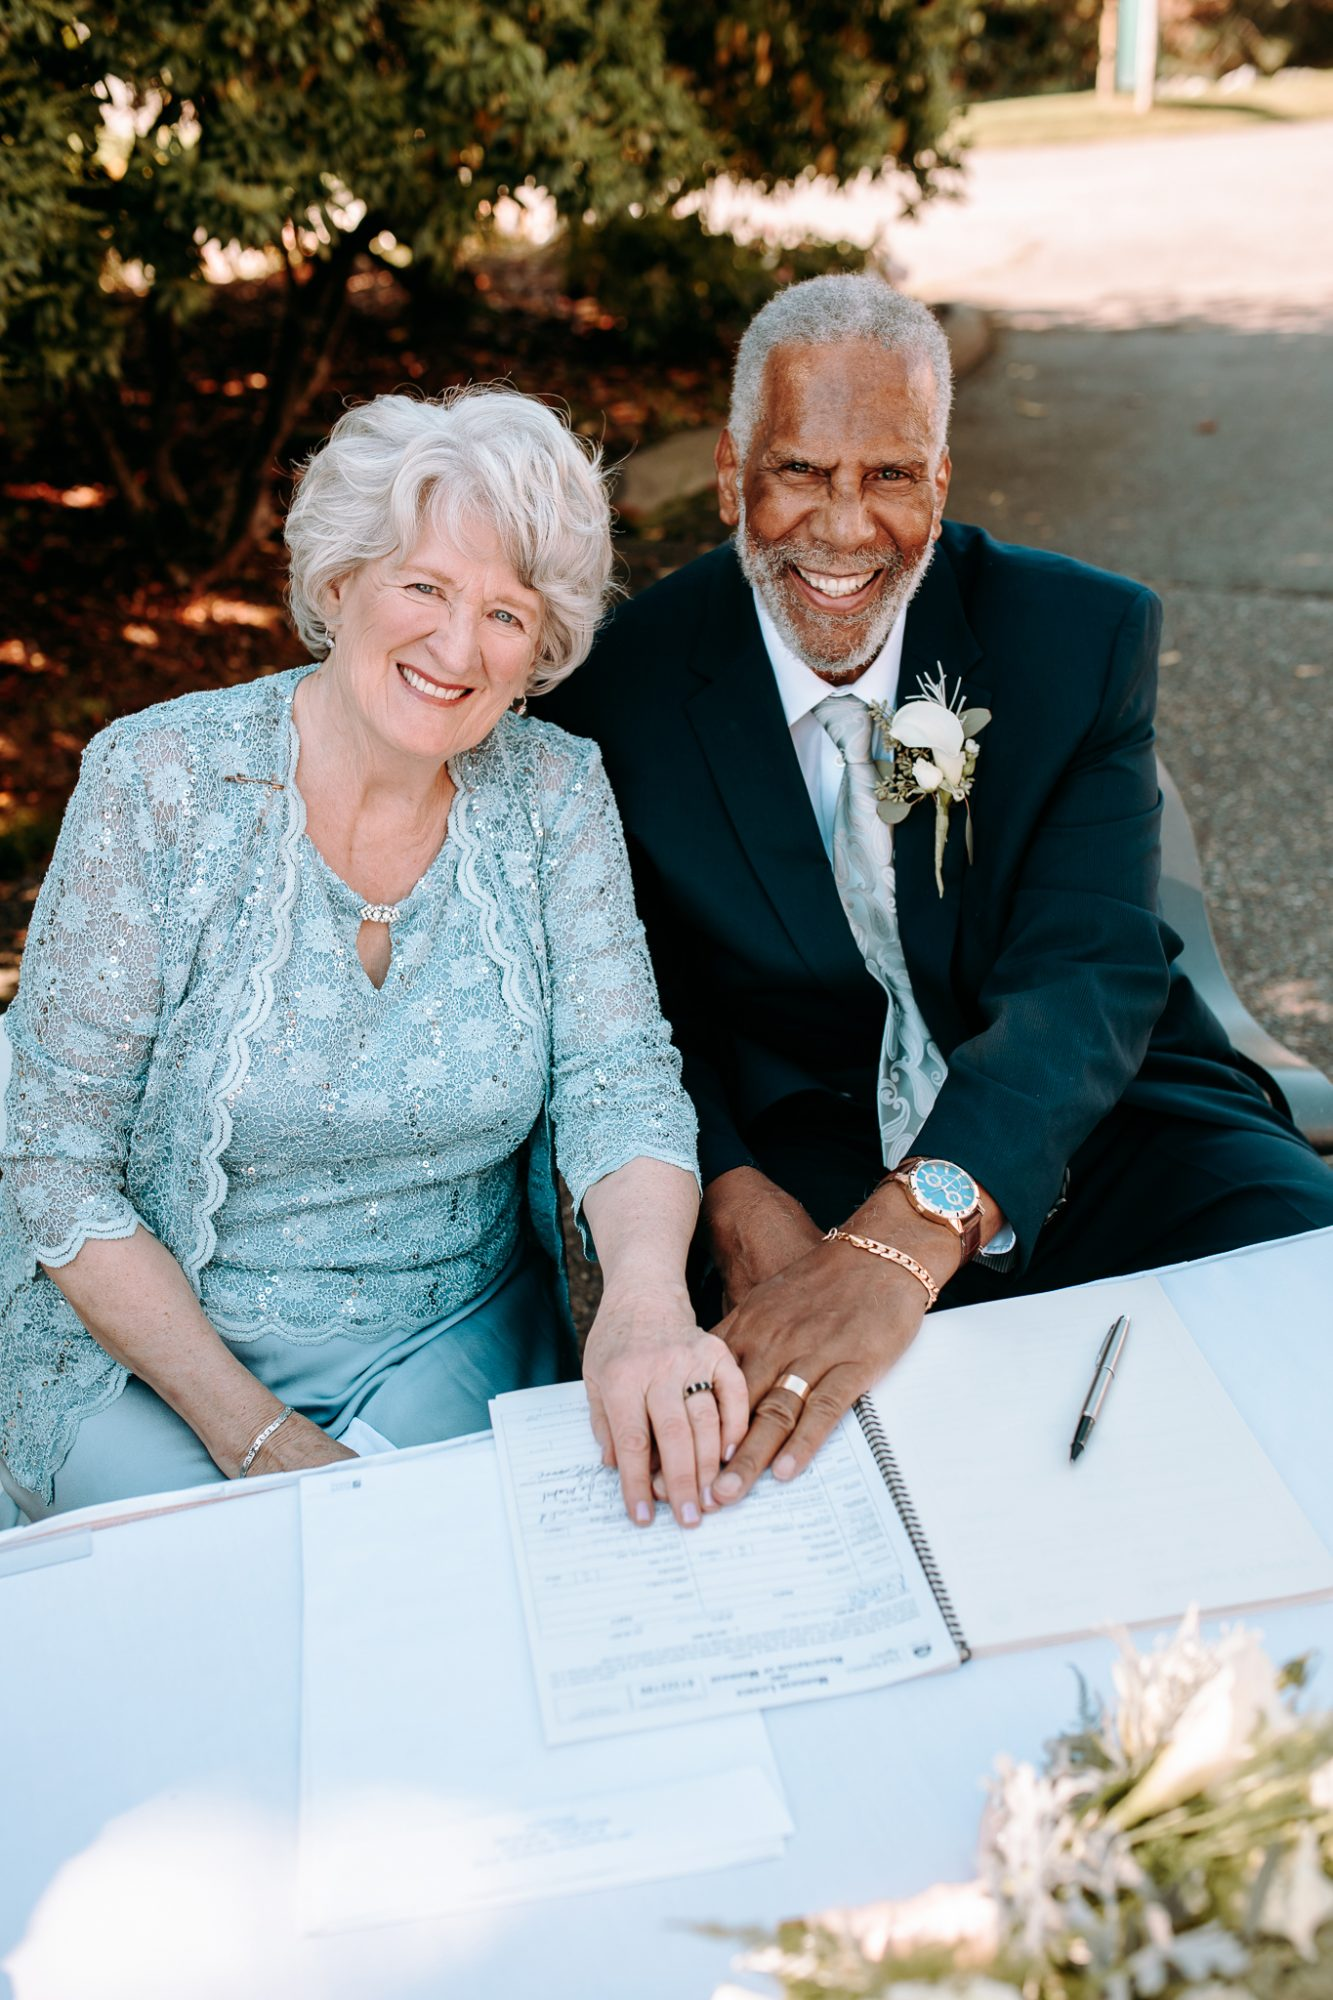 Jim Adams y Audrey Coutts